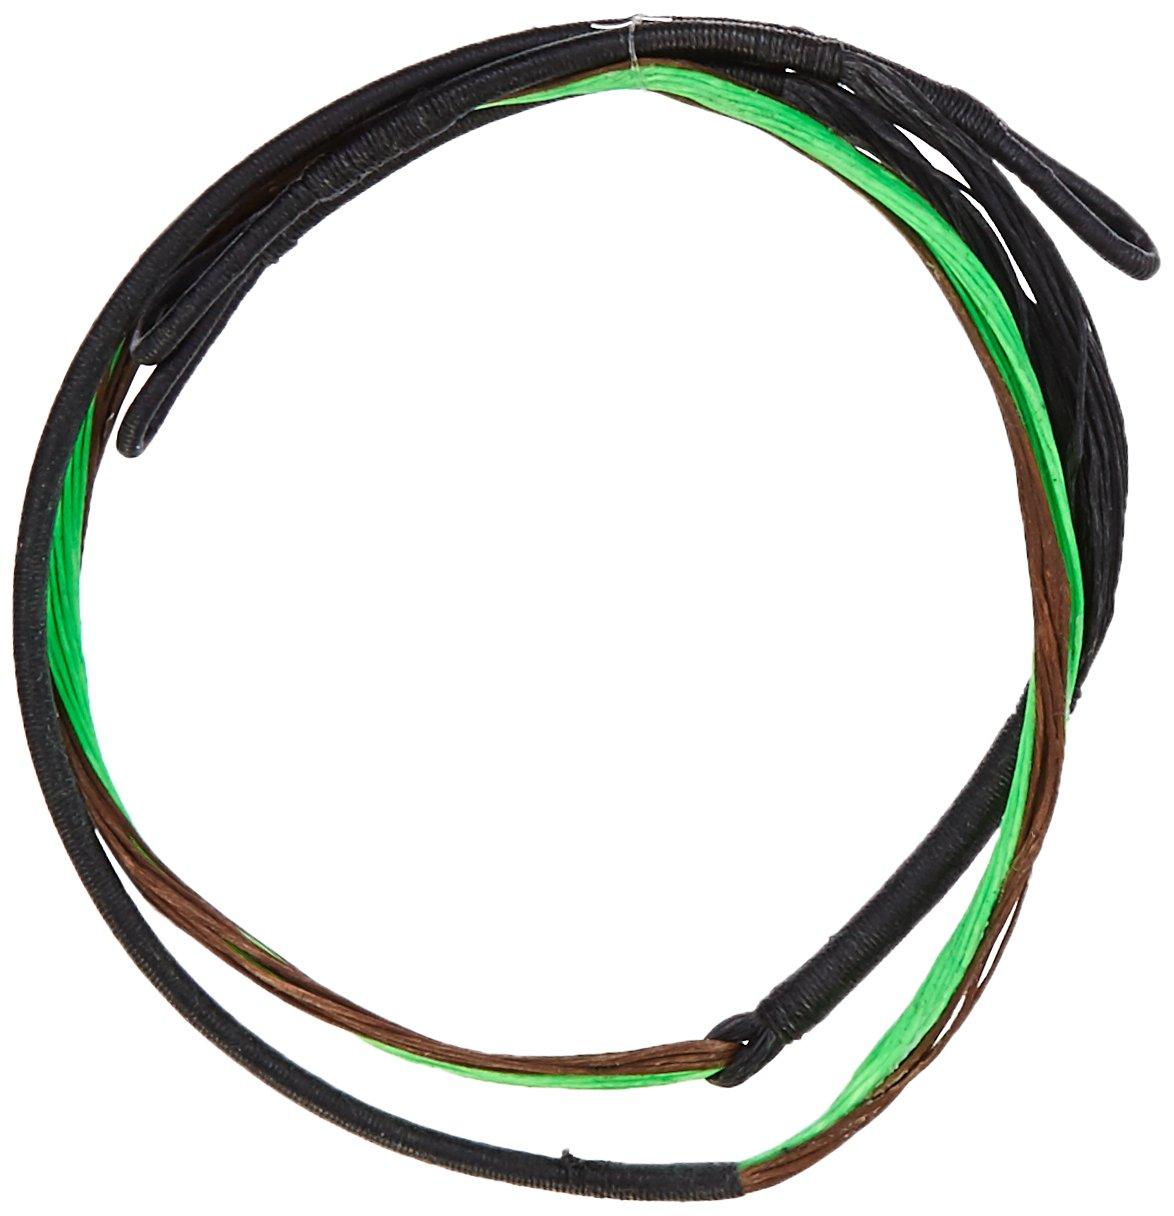 Barnett 16173 Jackal Cables by Barnett